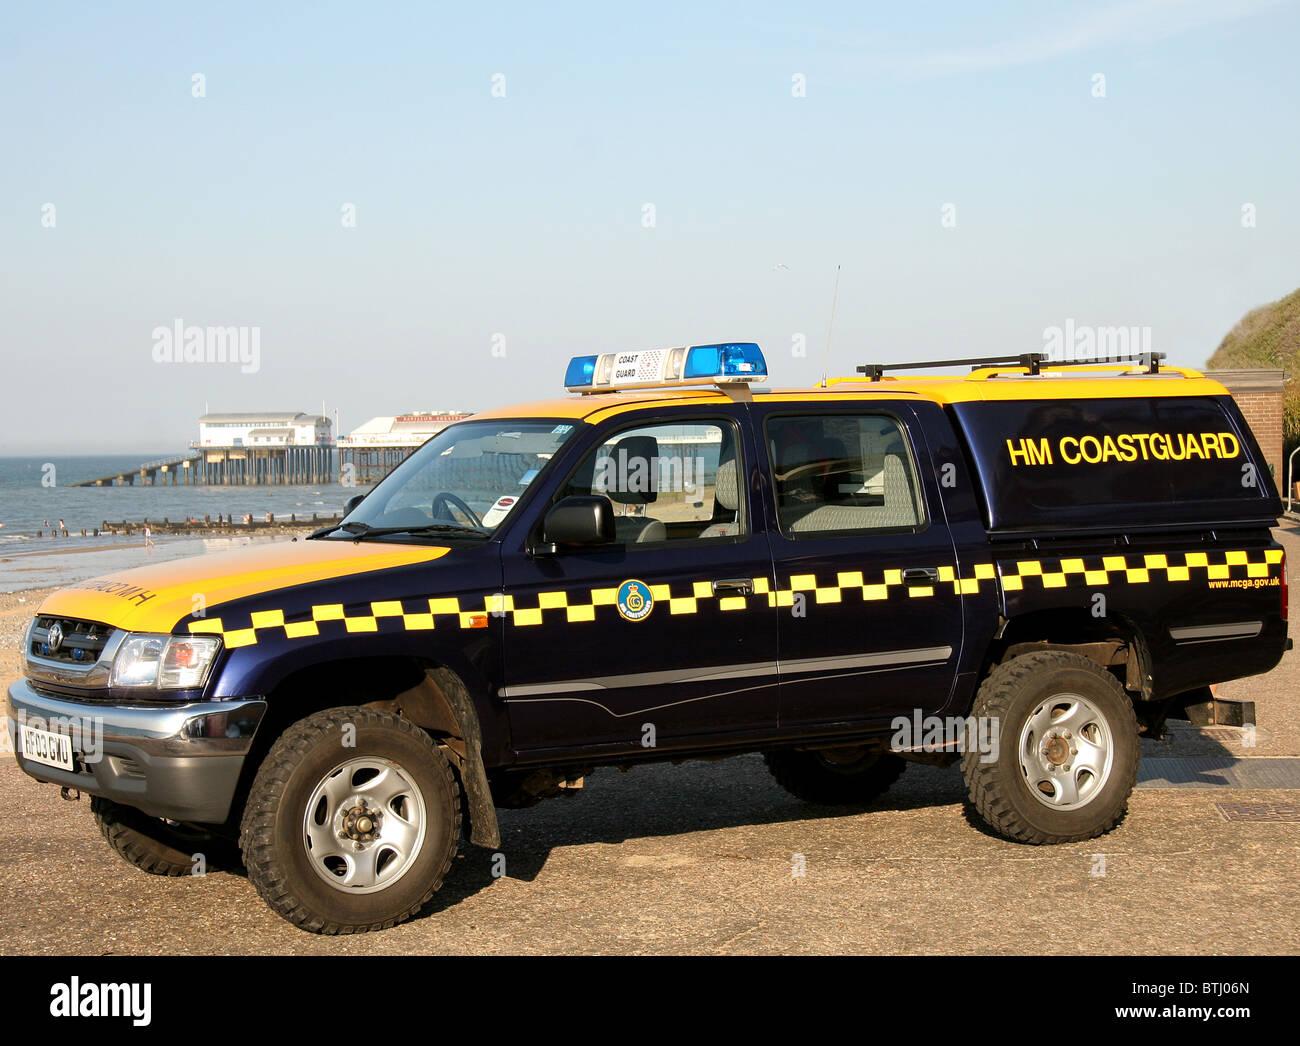 H.M Coastguard Coastguard Rescue Vehicle CRV at Cromer. Cromer lifeboat station in the background. - Stock Image